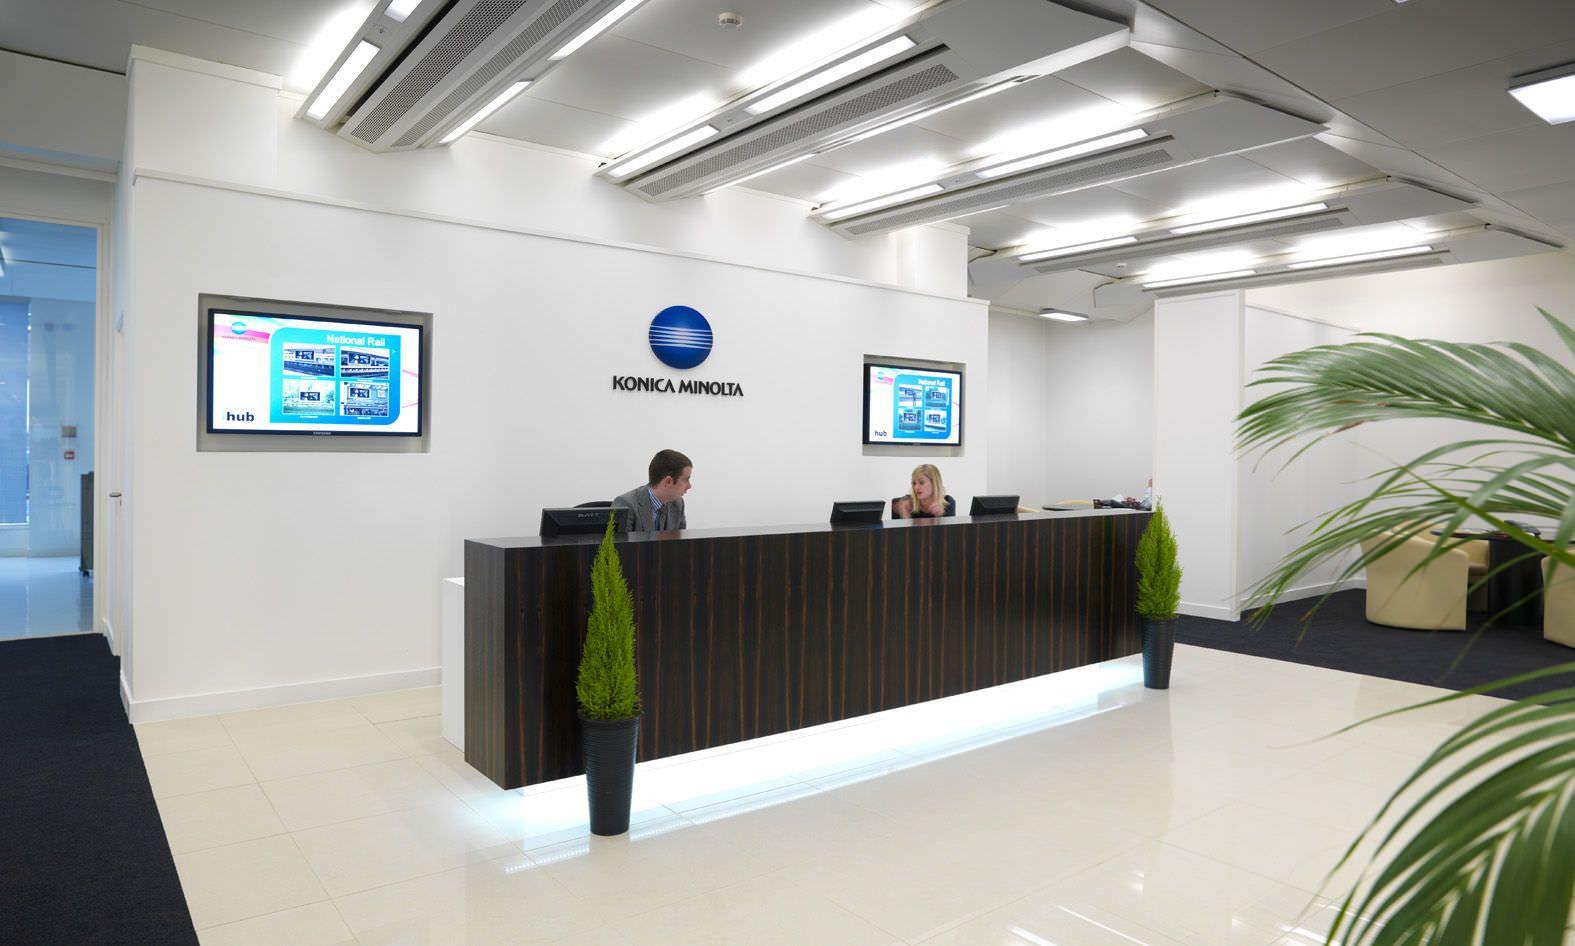 1000 images about reception desk design on pinterest led shape design and reception desks acrylic lighted reception desk reception counter design